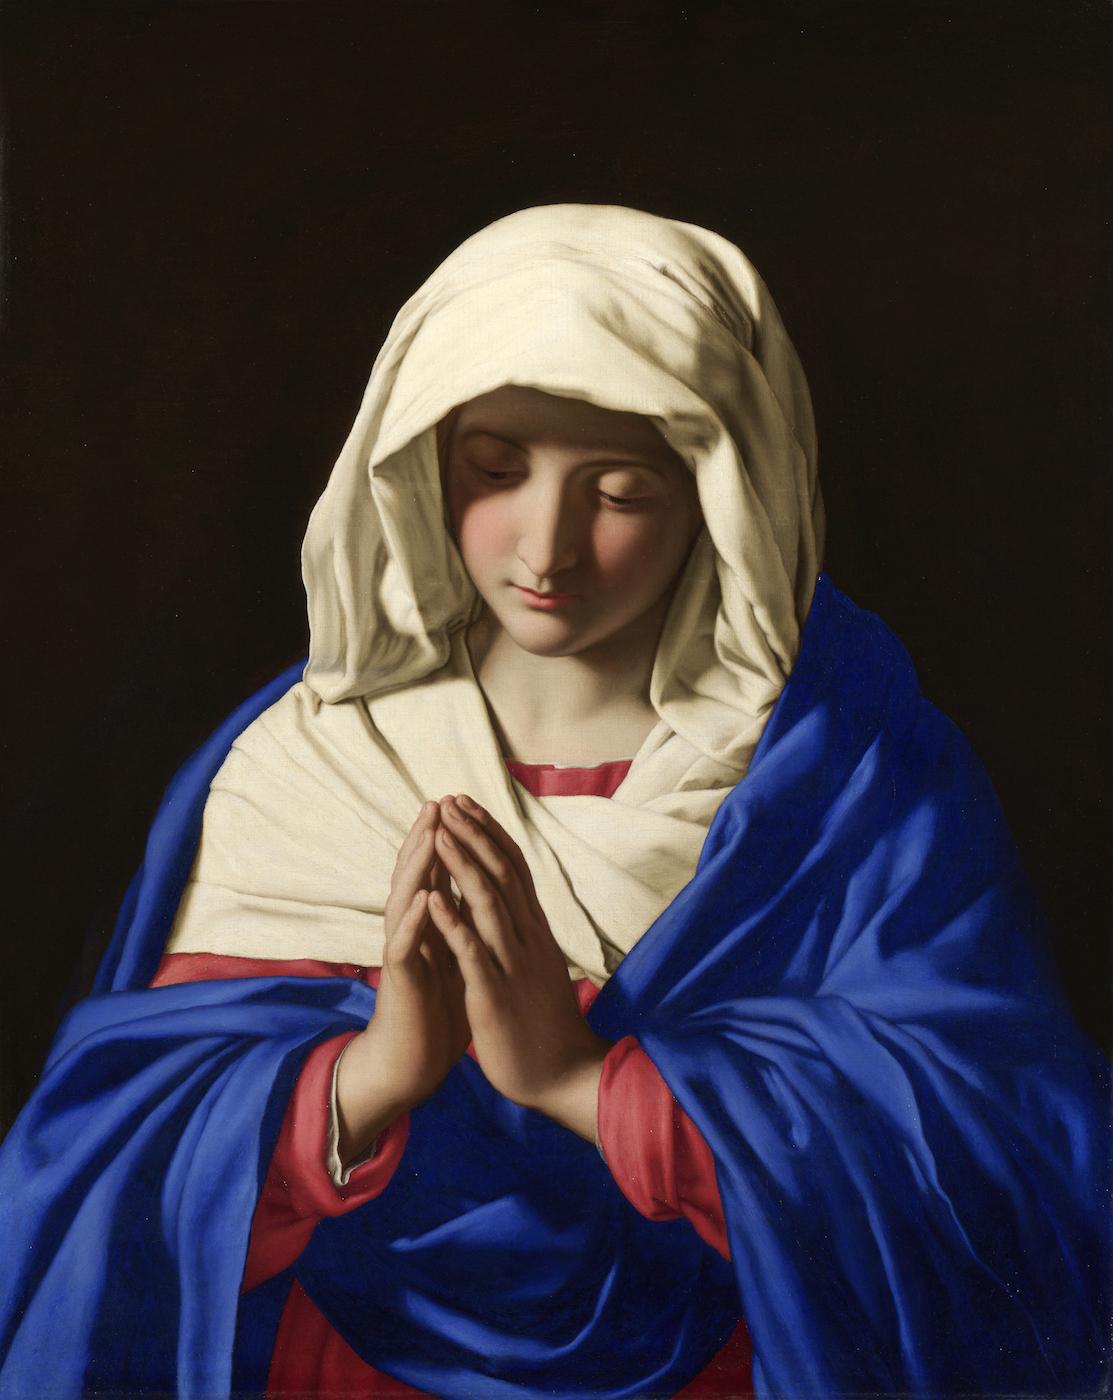 "Giovanni Battista Salvi da Sassoferrato, ""The Virgin in Prayer"" (1640-50), oil on canvas, with lapis lazuli pigment on her clothing (via National Gallery, London/Wikimedia)"